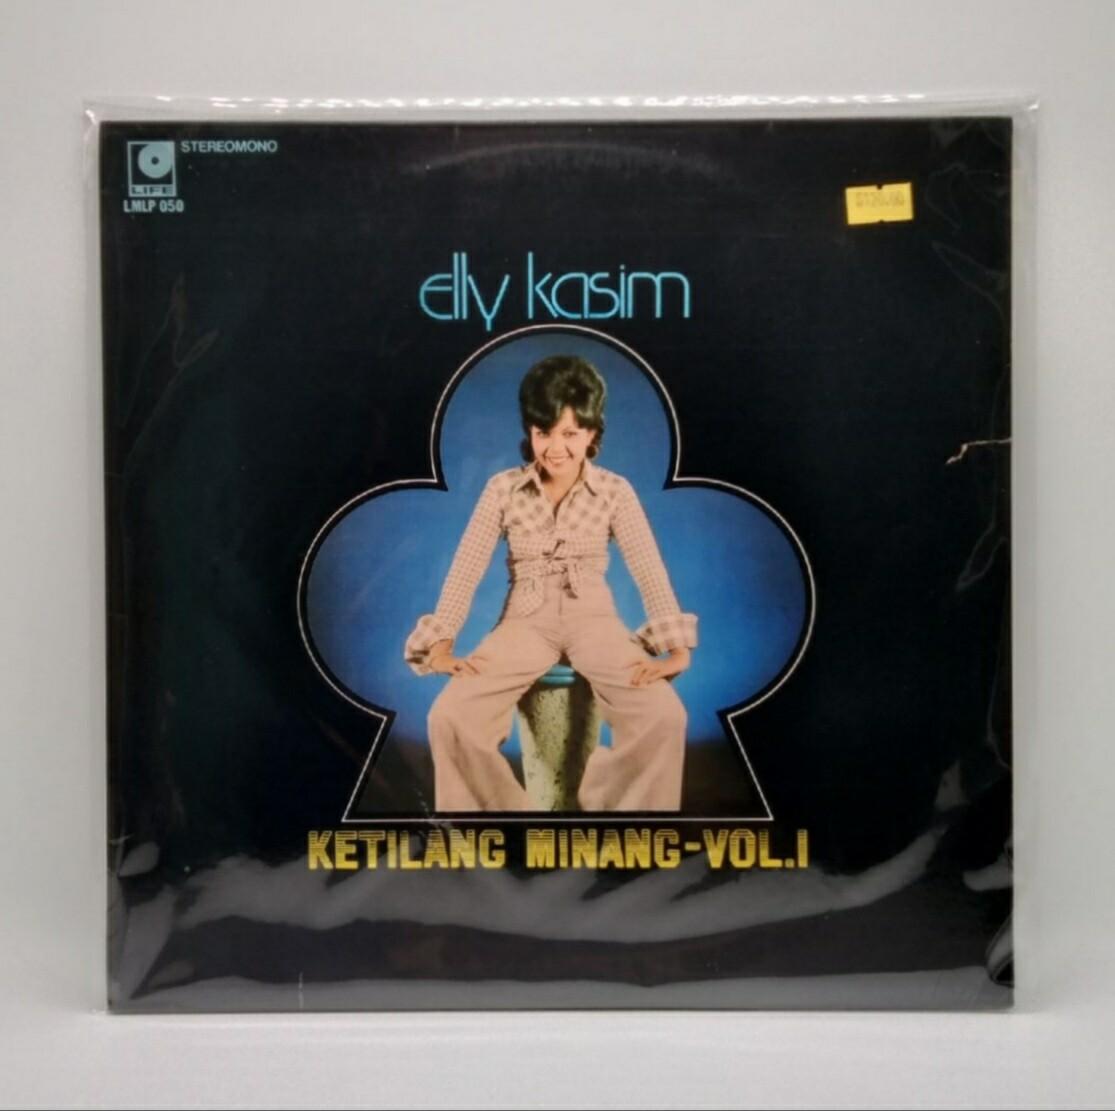 [USED] ELLY KASIM -KETILANG MINANG VOL. 1- LP